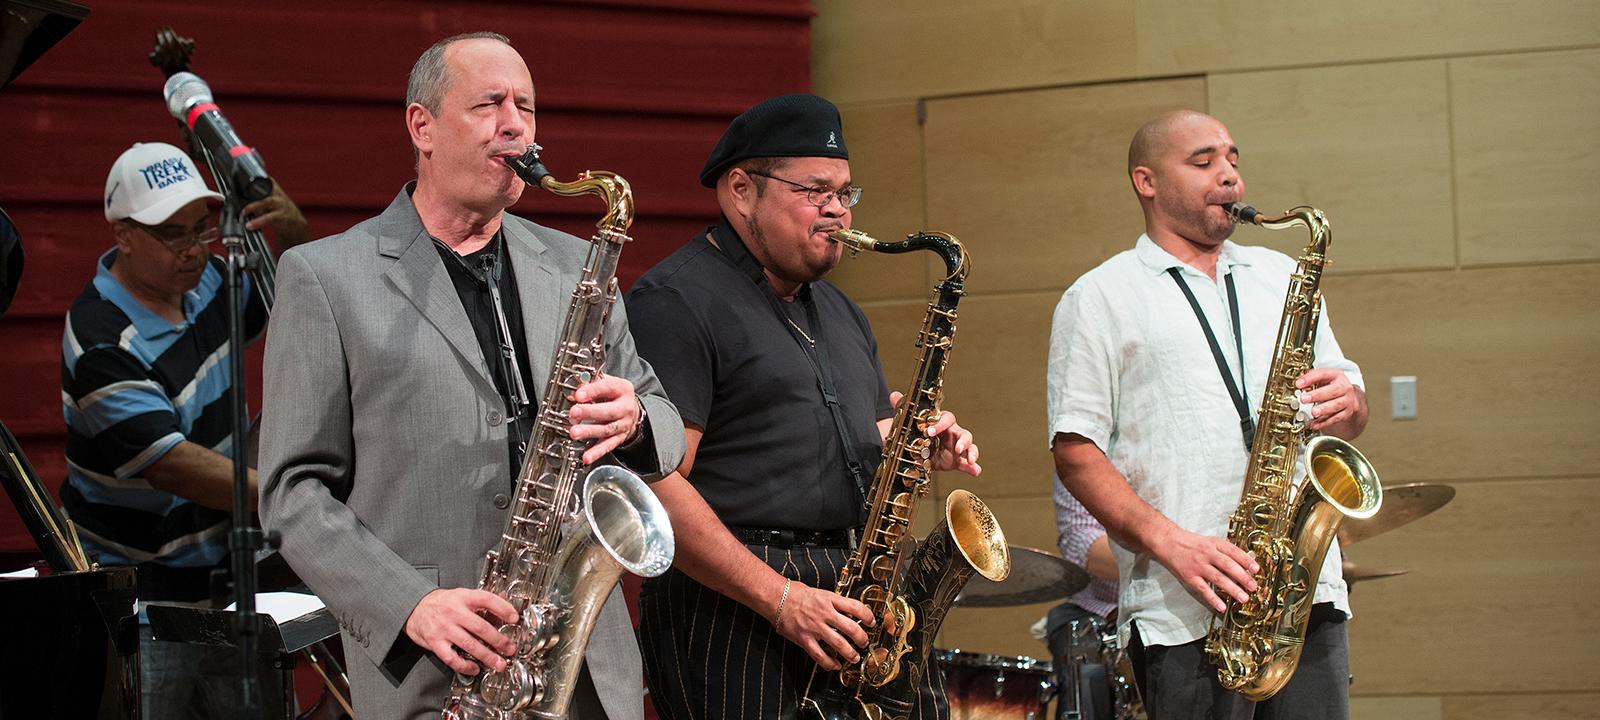 Buy Tickets to Tony Dagradi's tribute to Coltrane on Thursday Sept. 20